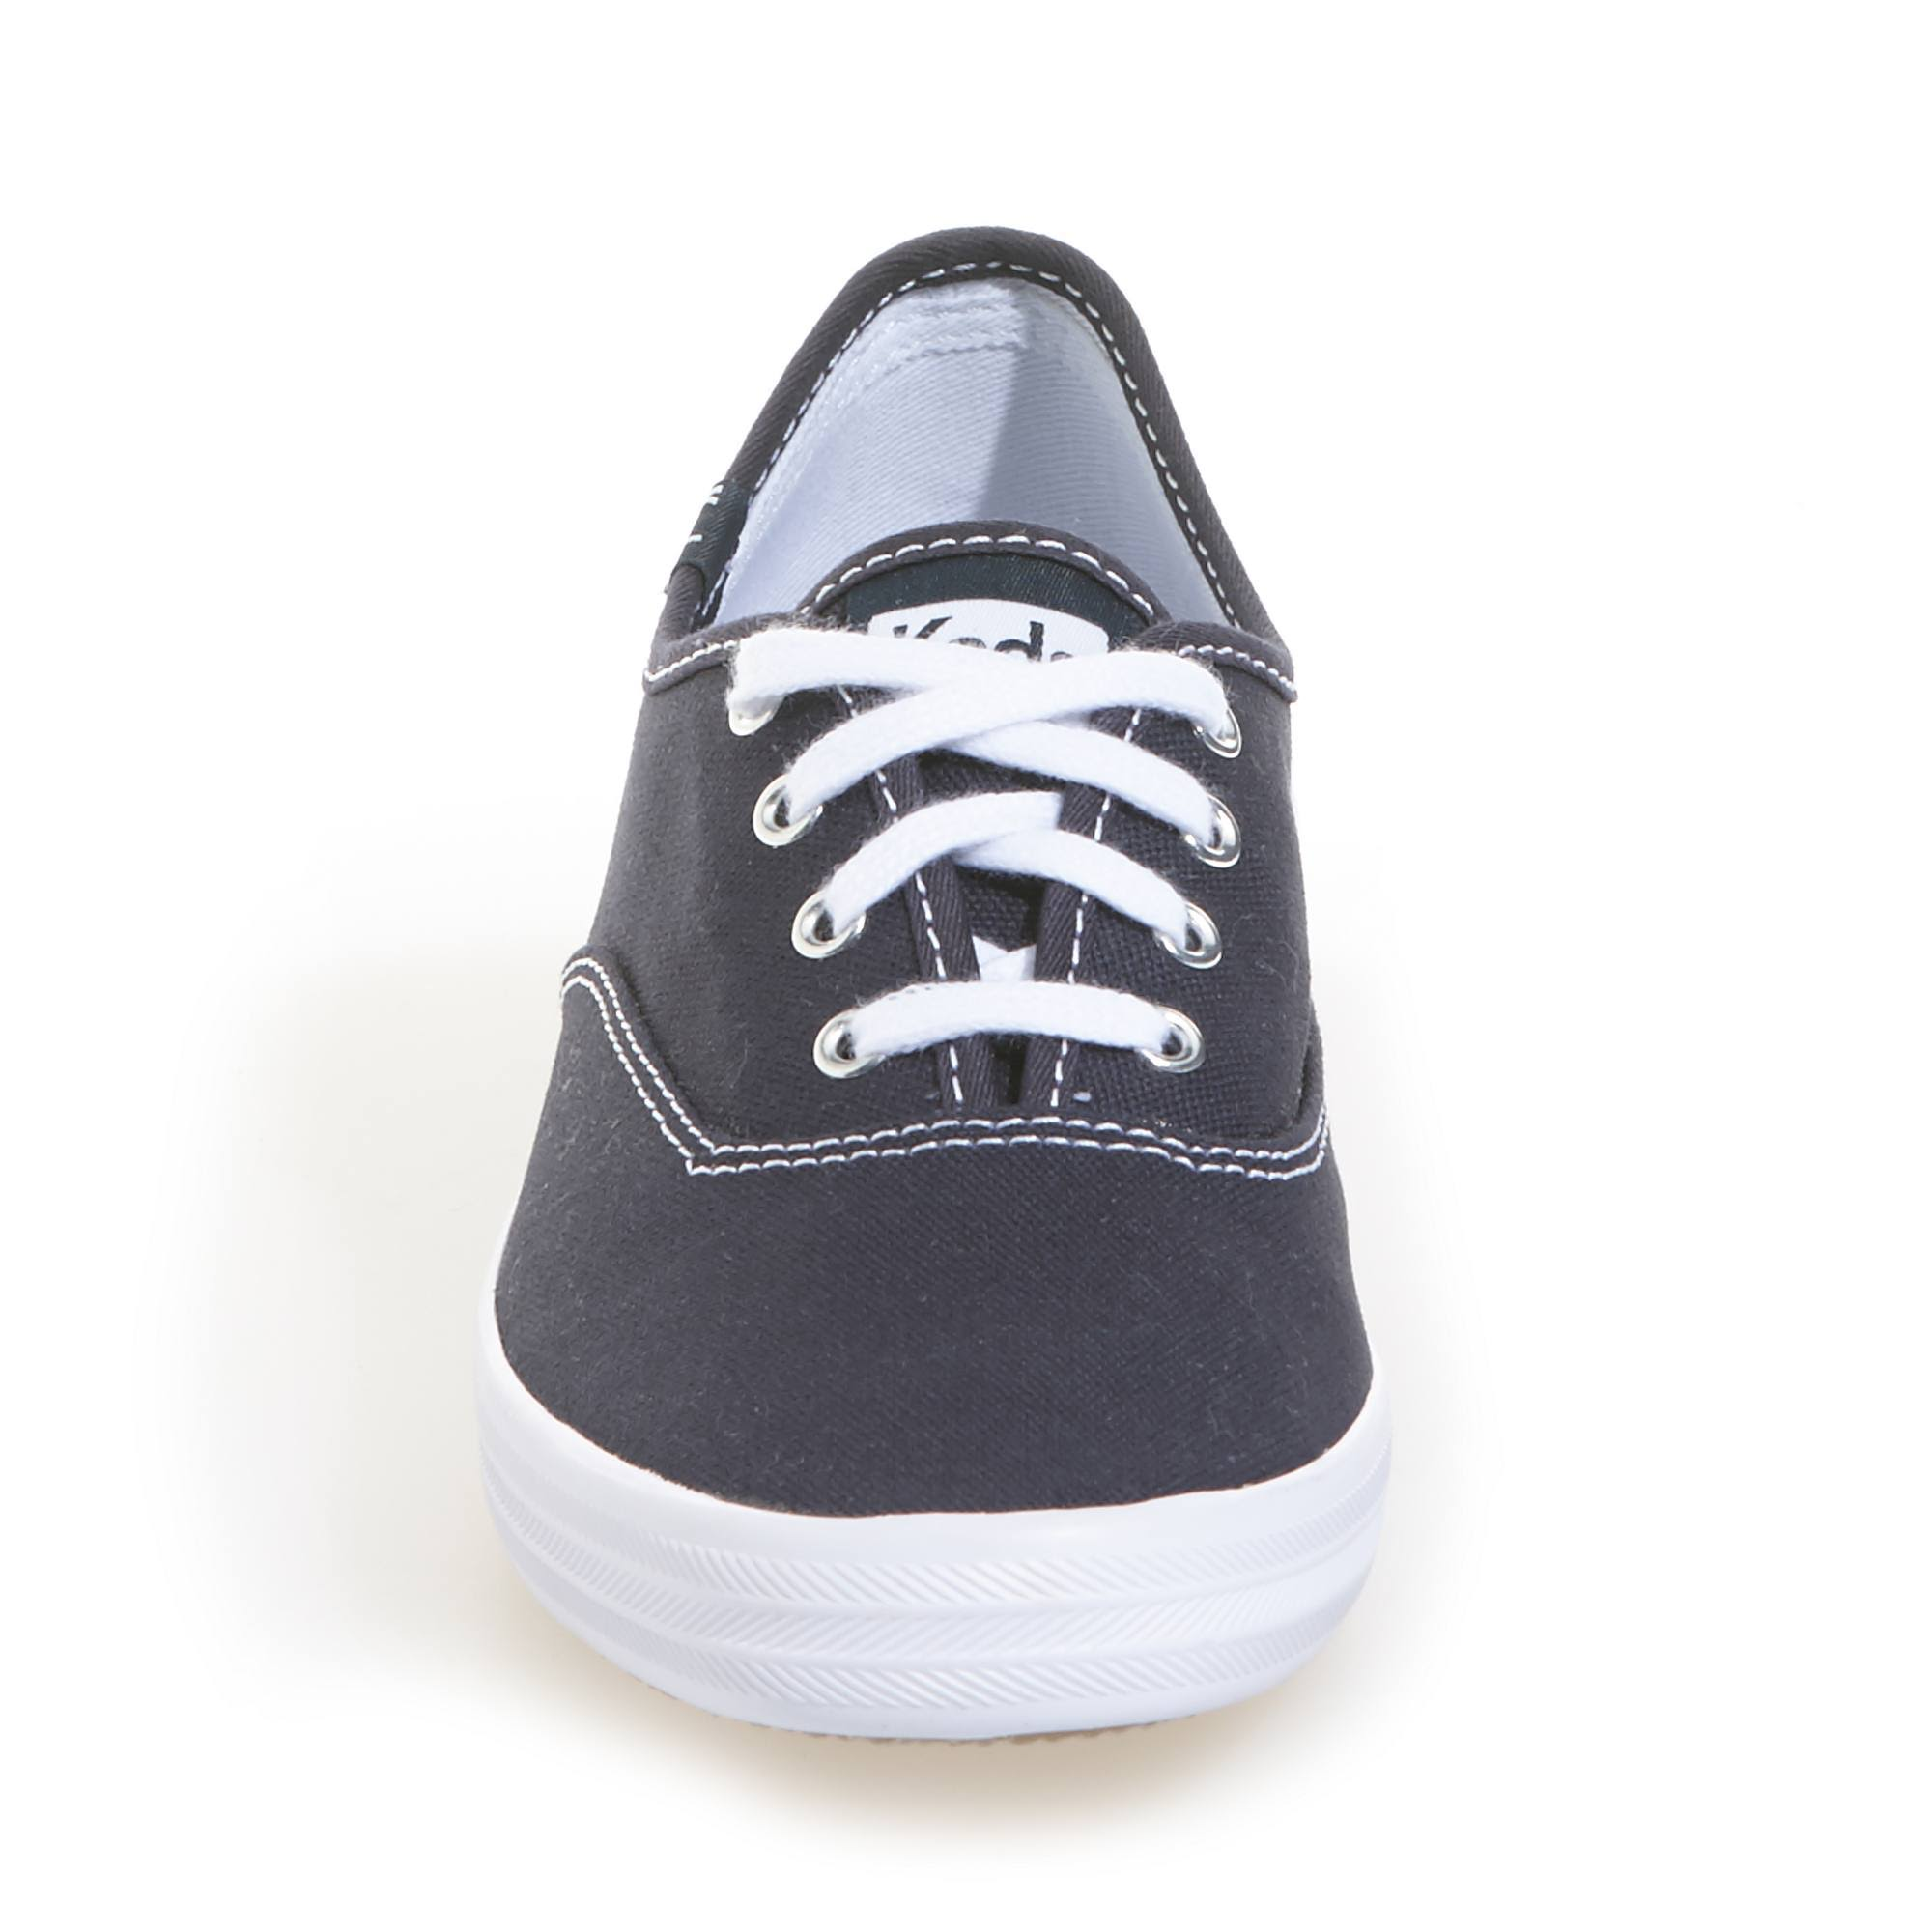 Lona Tamaño De 5 Sneaker 8 Talla Champion Marino Keds Azul Baja qg8Oftyxw